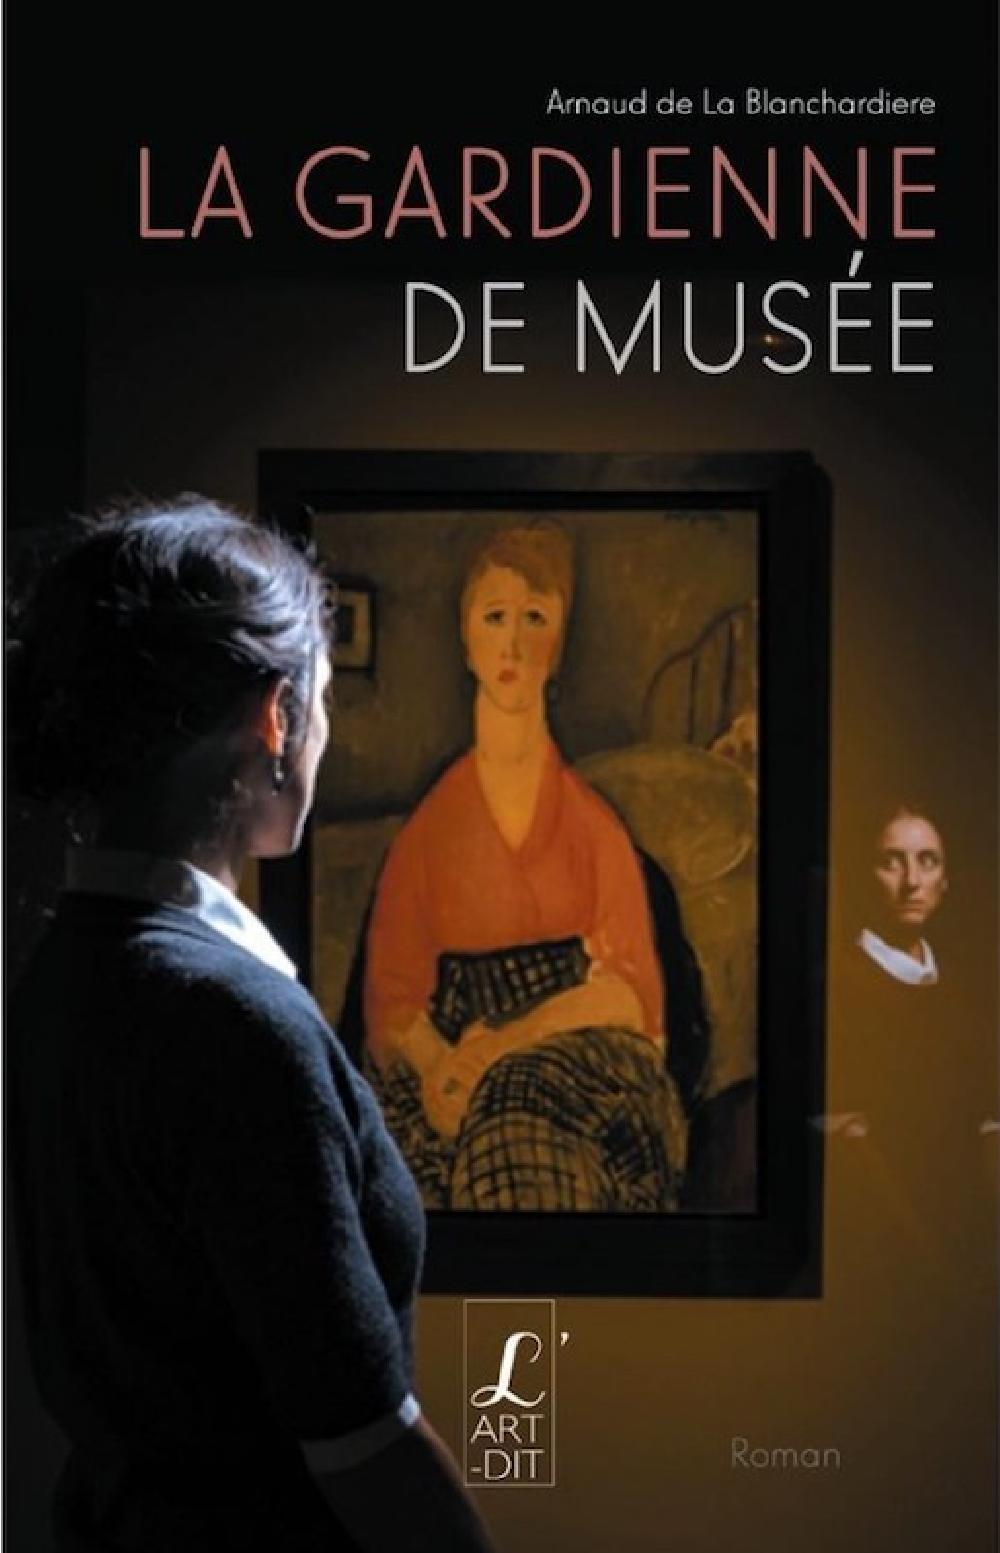 La gardienne de musée